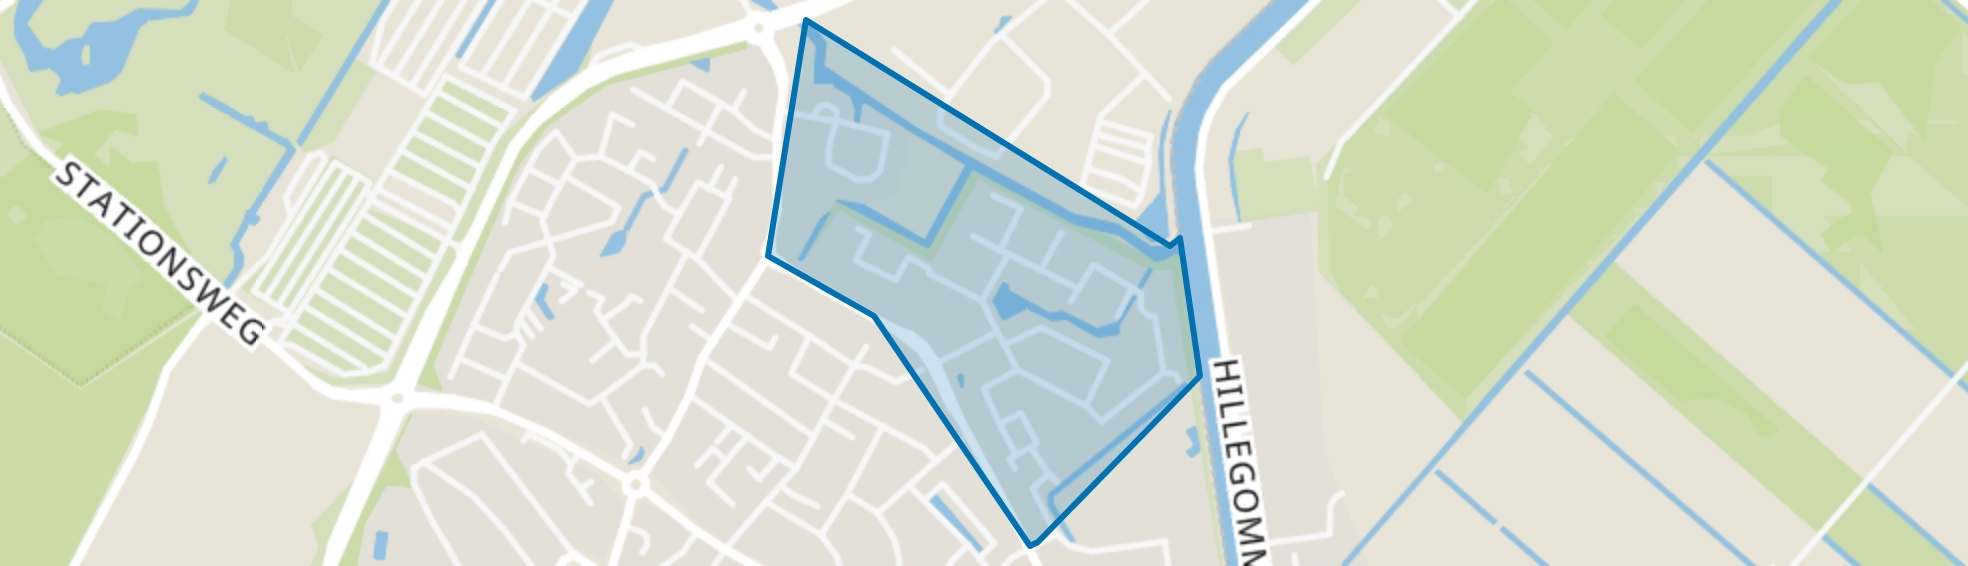 Meerenburgh, Lisse map